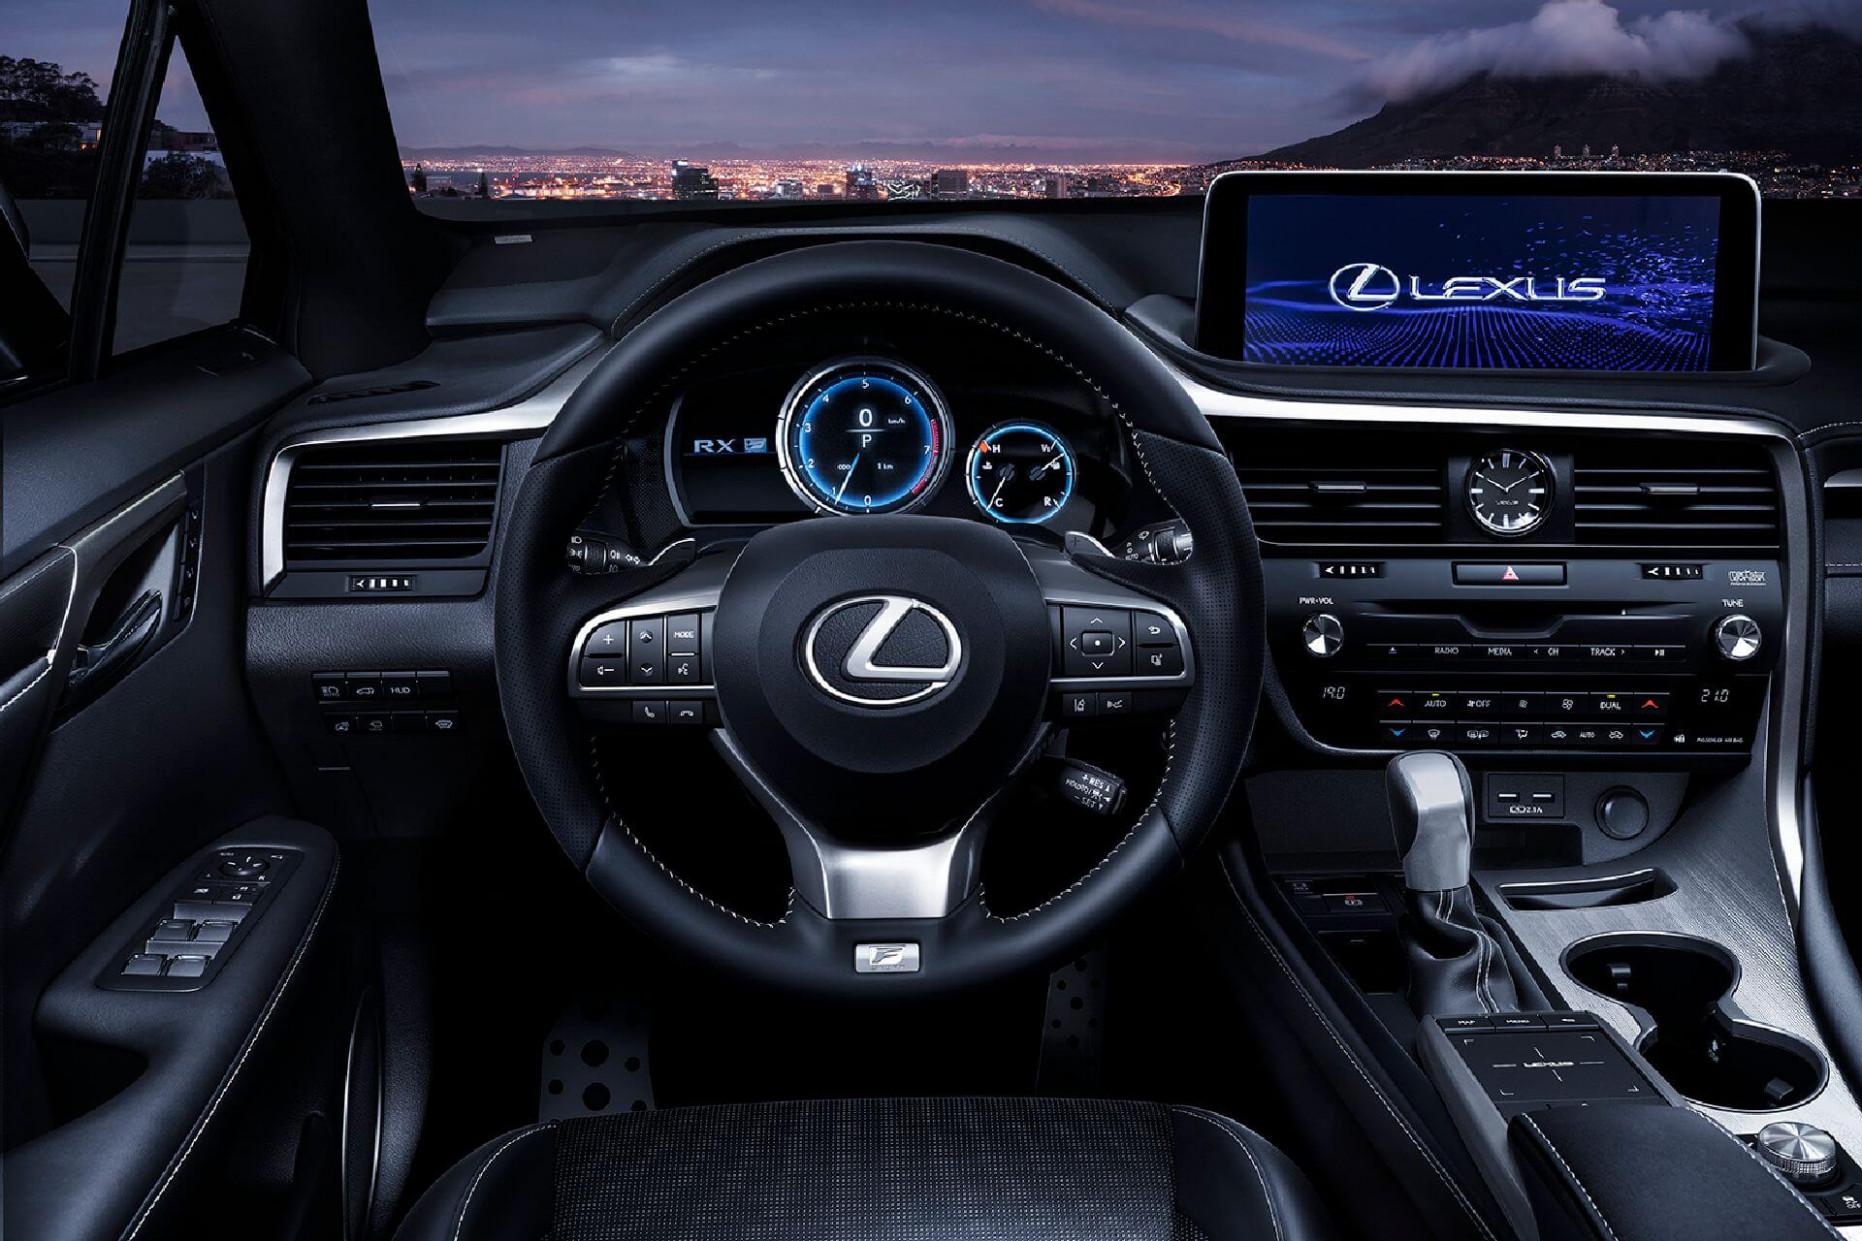 Performance Lexus Rx 350 F Sport 2022